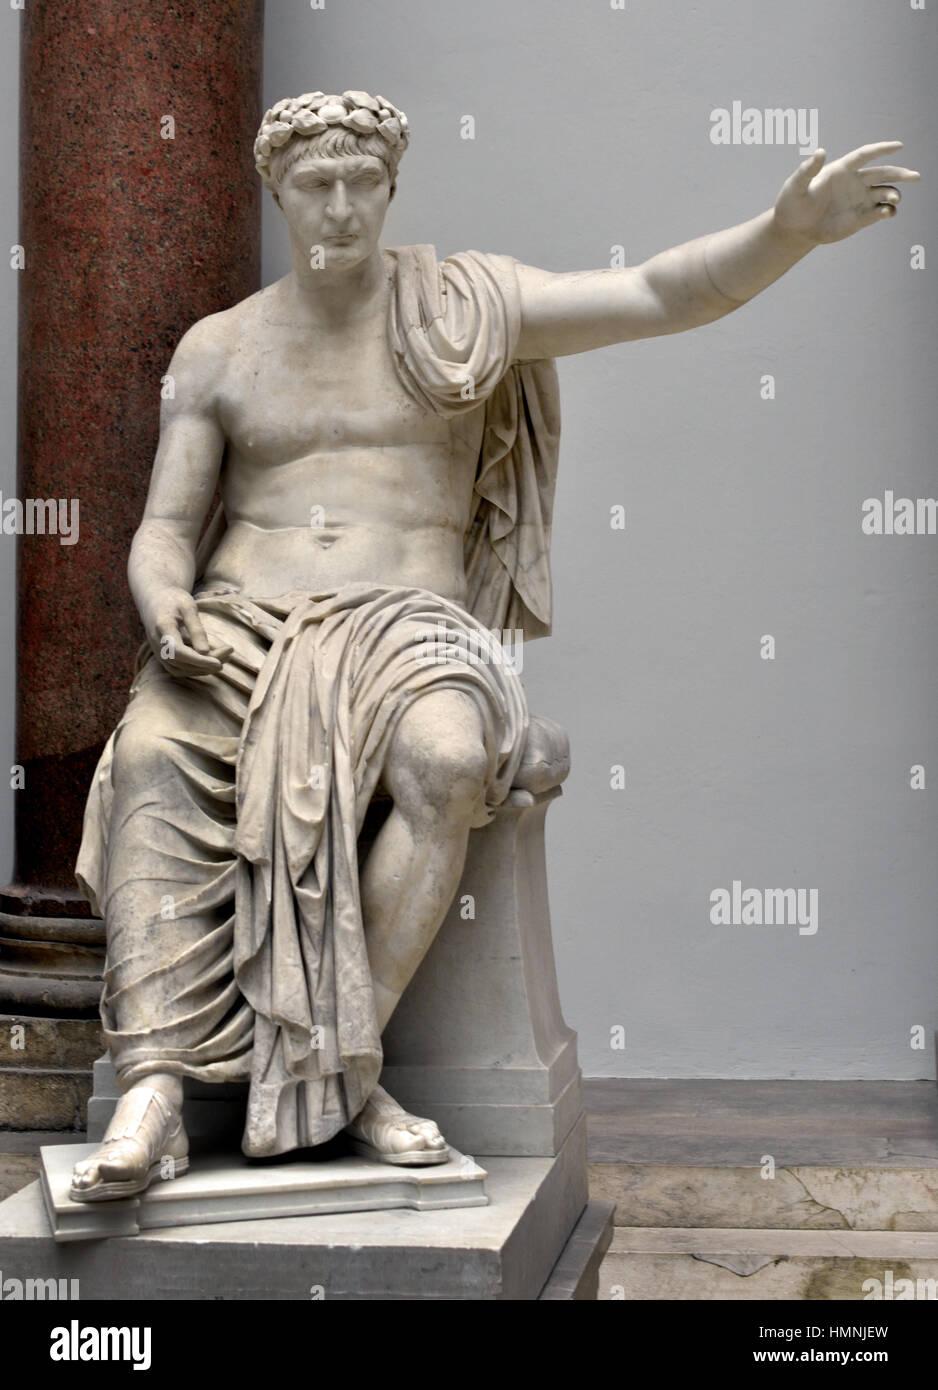 Sitzen, Trajan - Marcus Ulpius Nerva Traianus Augustus 53-117 n. Chr. römischer Kaiser, Rom, Italien, Italienisch, Stockbild